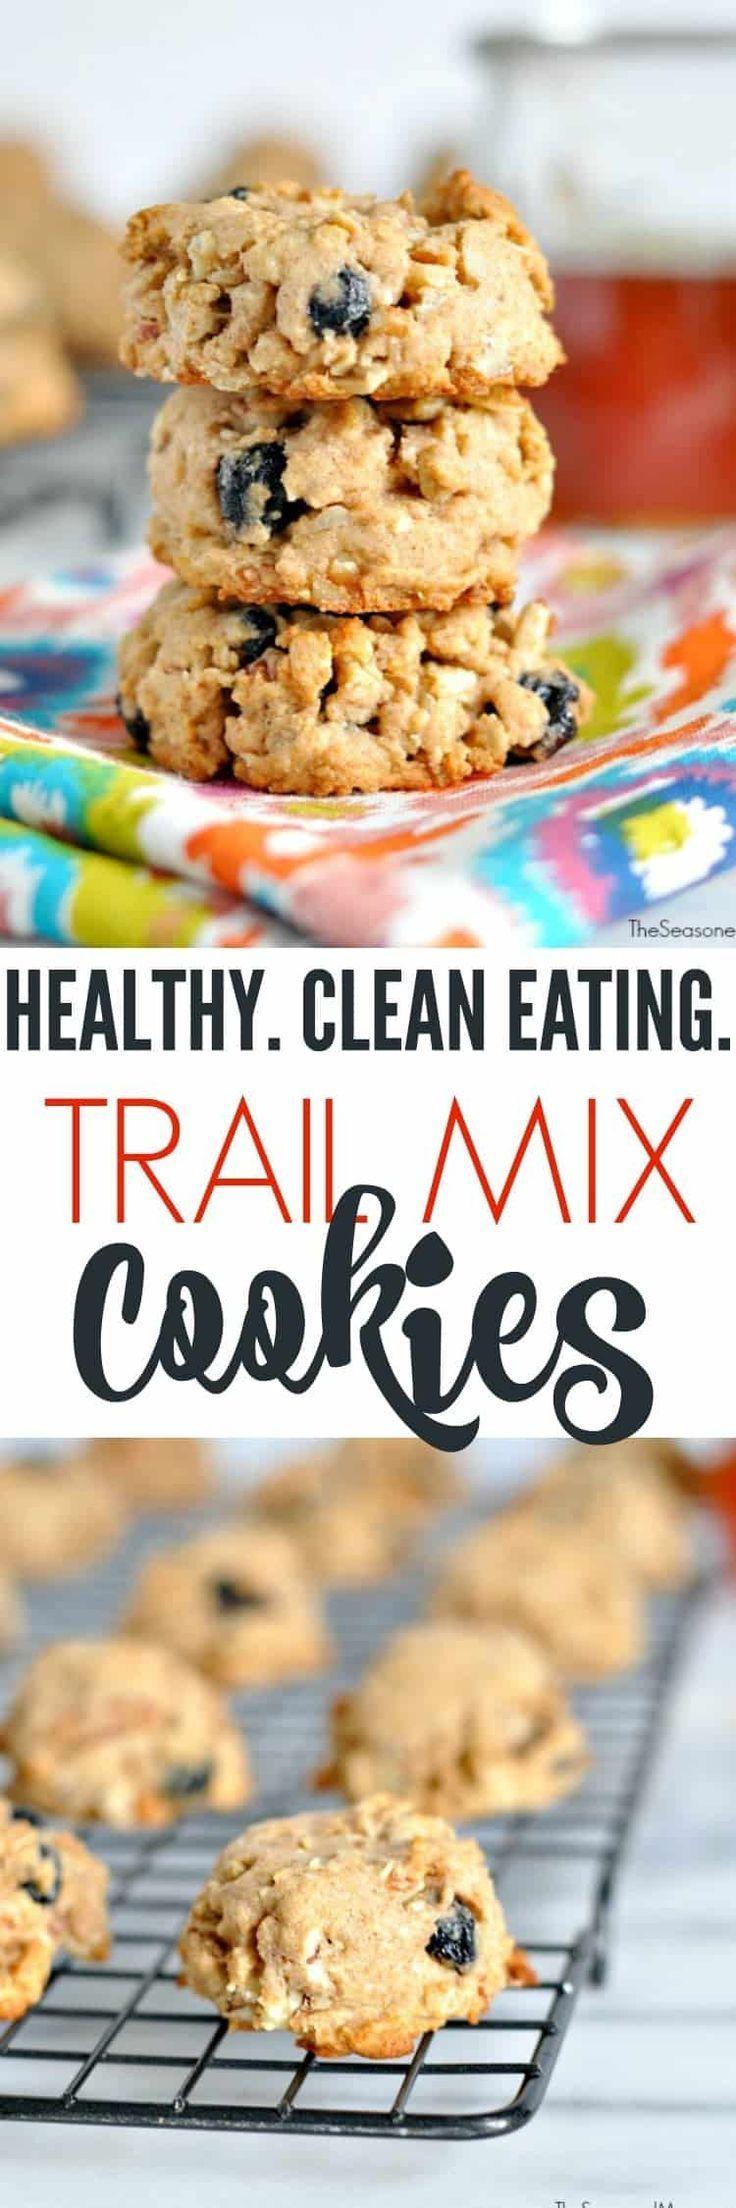 Gesunde Trail Mix Cookies – Cookies – #Cookies #Gesund #Mix #Trail   – Studenten…